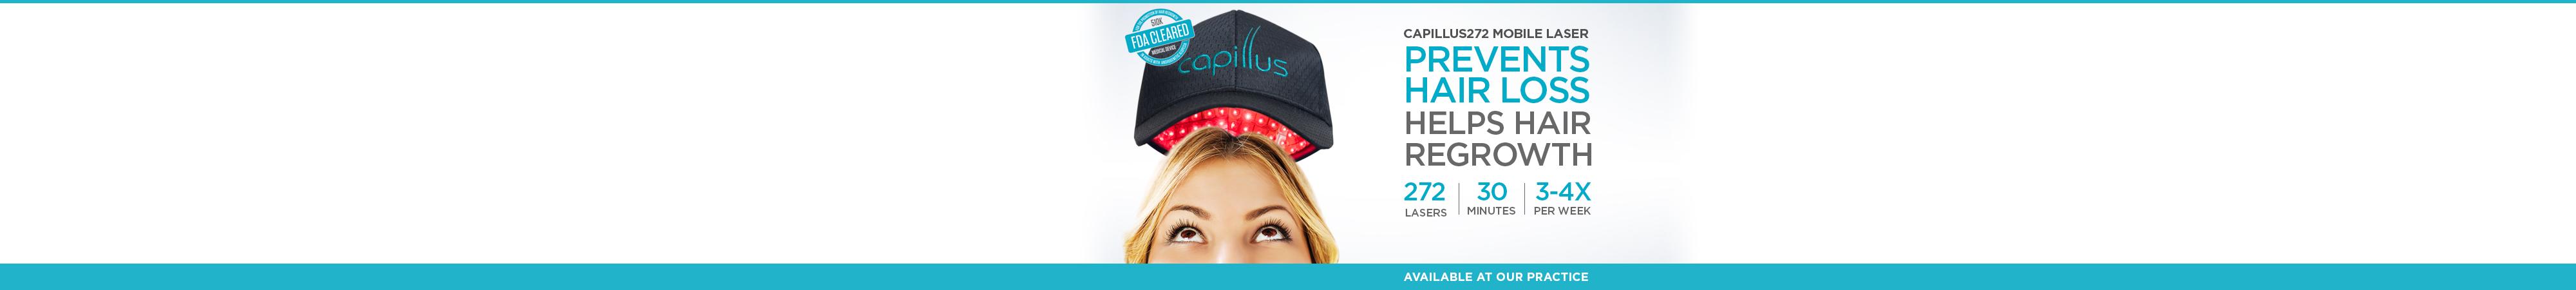 Capillus-651Hair-Image